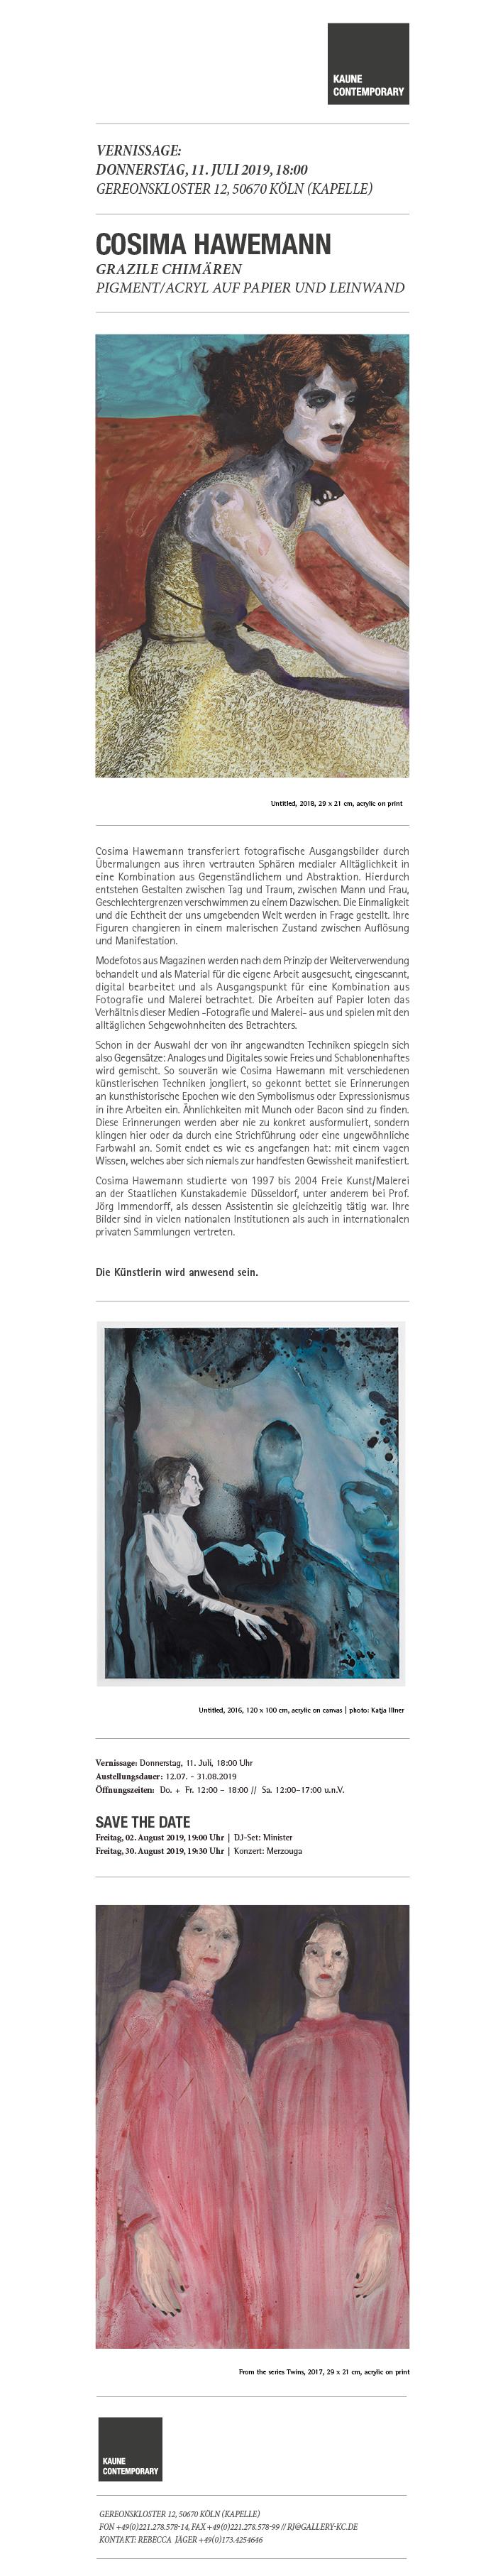 Cosima Hawemann - Grazile Chimären # Vernissage 11.07.2019, 18:00 Uhr # DJ-Set: Minister 02.08.2019, 19:00 Uhr # Konzert: Merzouga 30.08.2019, 19:30 Uhr ||| Gereonskloster 12 (Kapelle), 50670 Köln